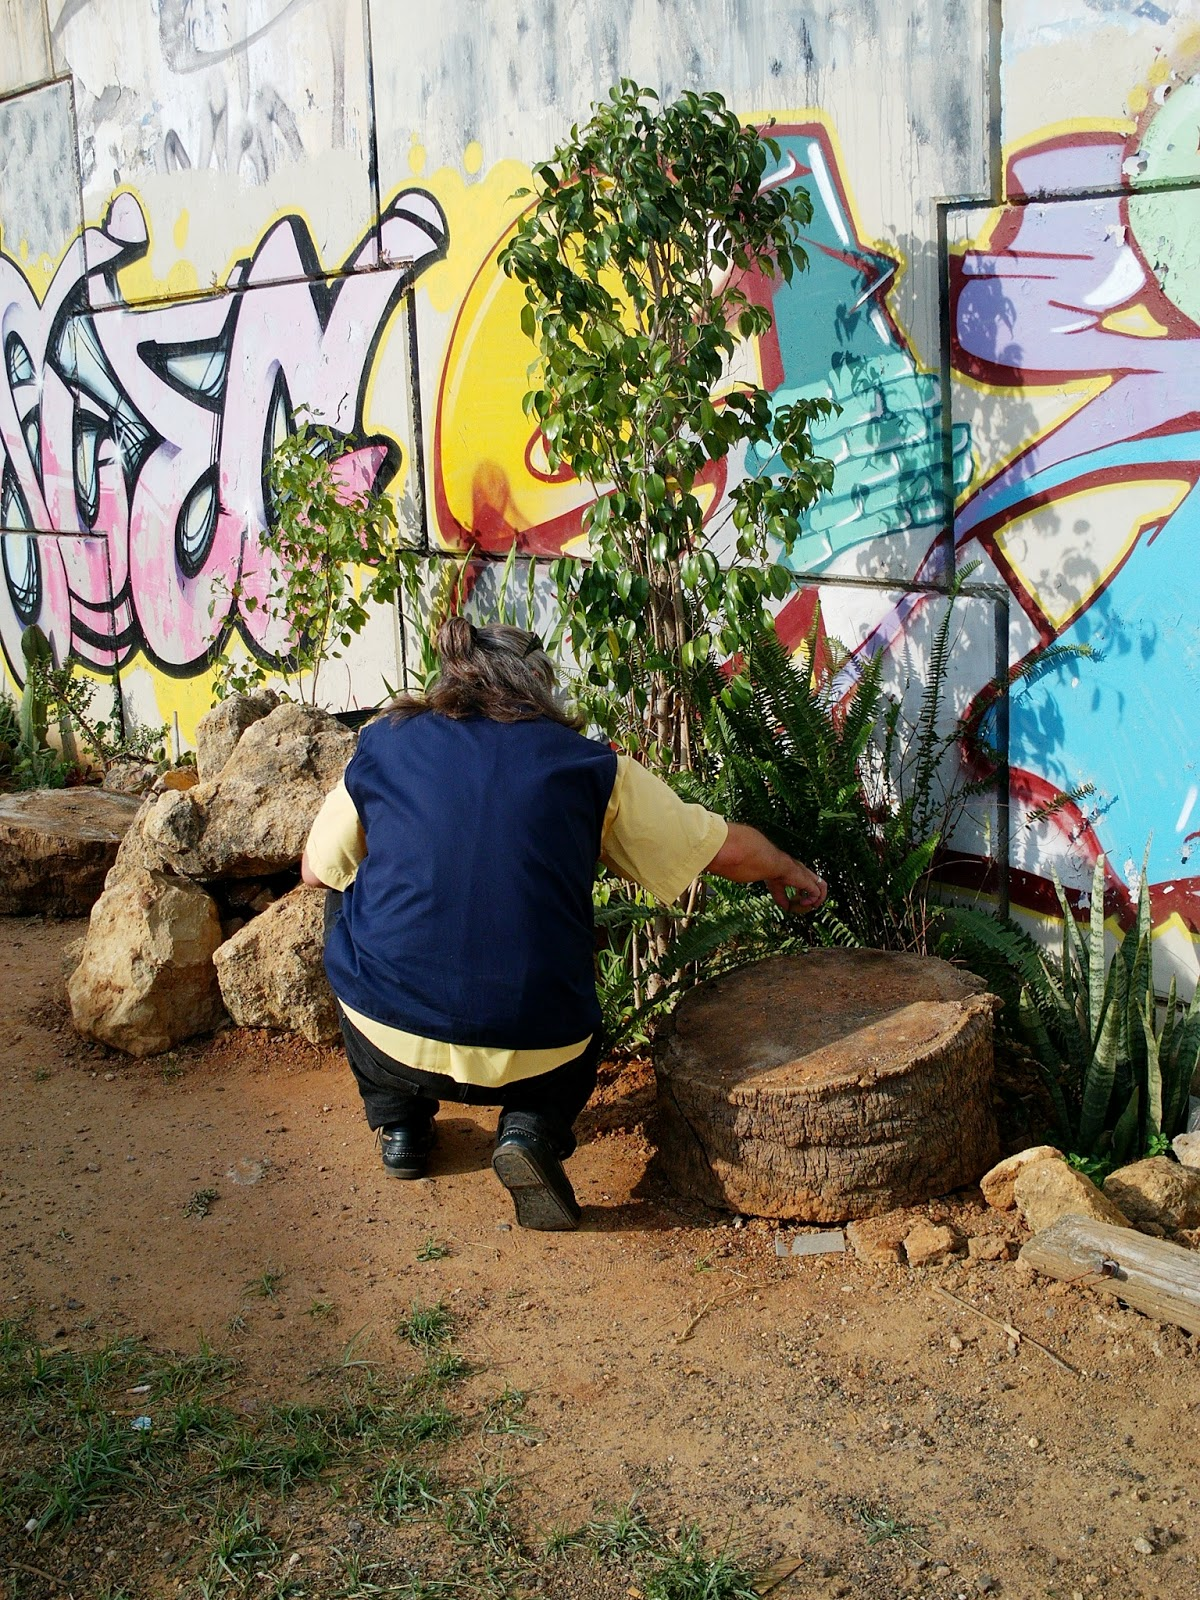 La cultura del jardin un jardin de postal - Un jardin para mi ...